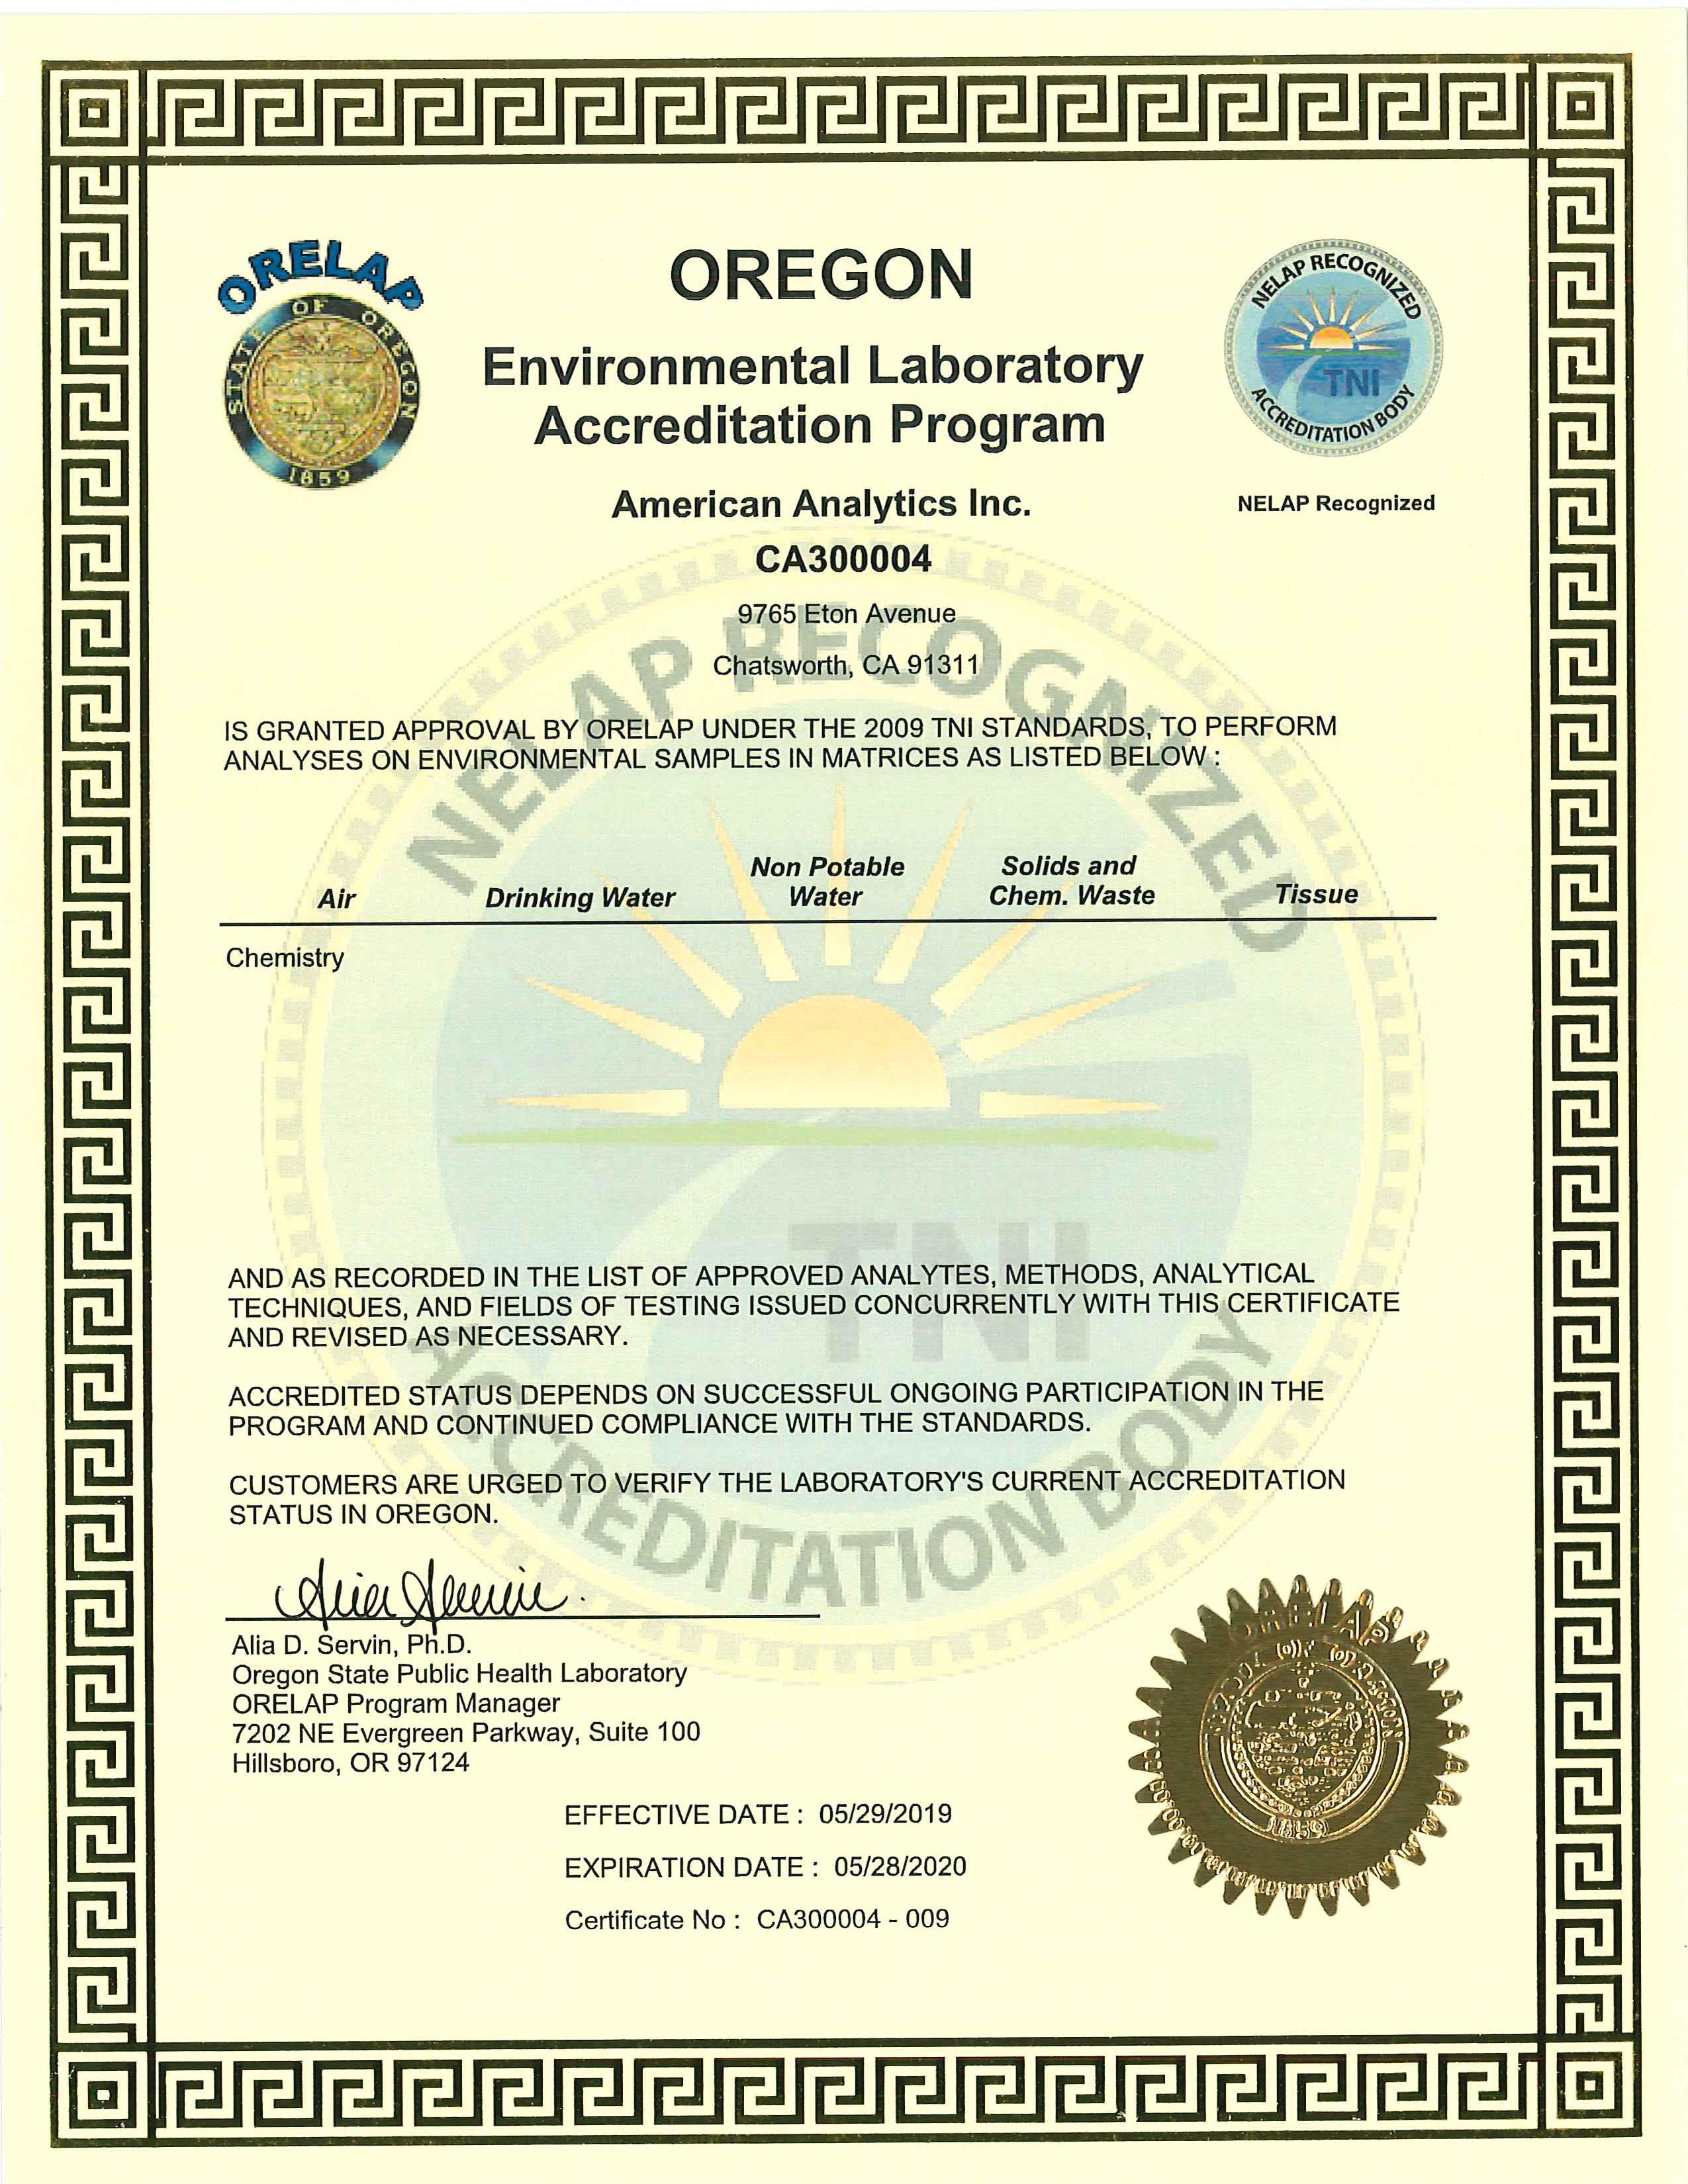 American Analytics NELAC certification